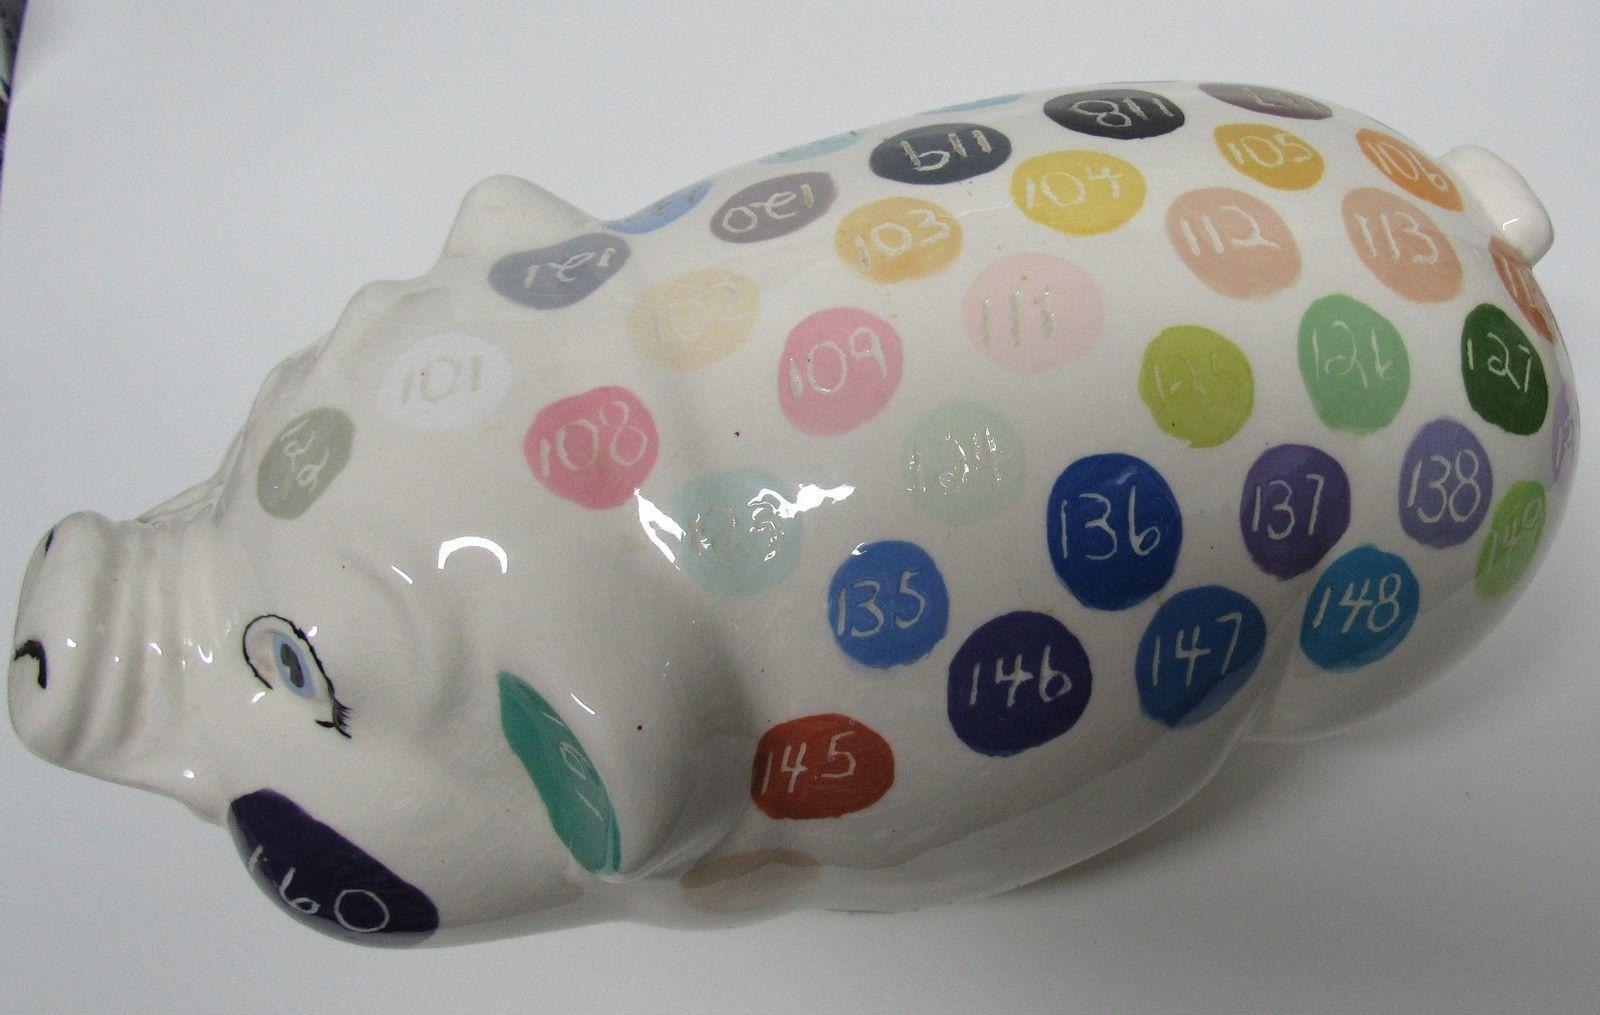 Test Glaze Ceramic Pig Duncan Cover Coats And 15 Similar Items